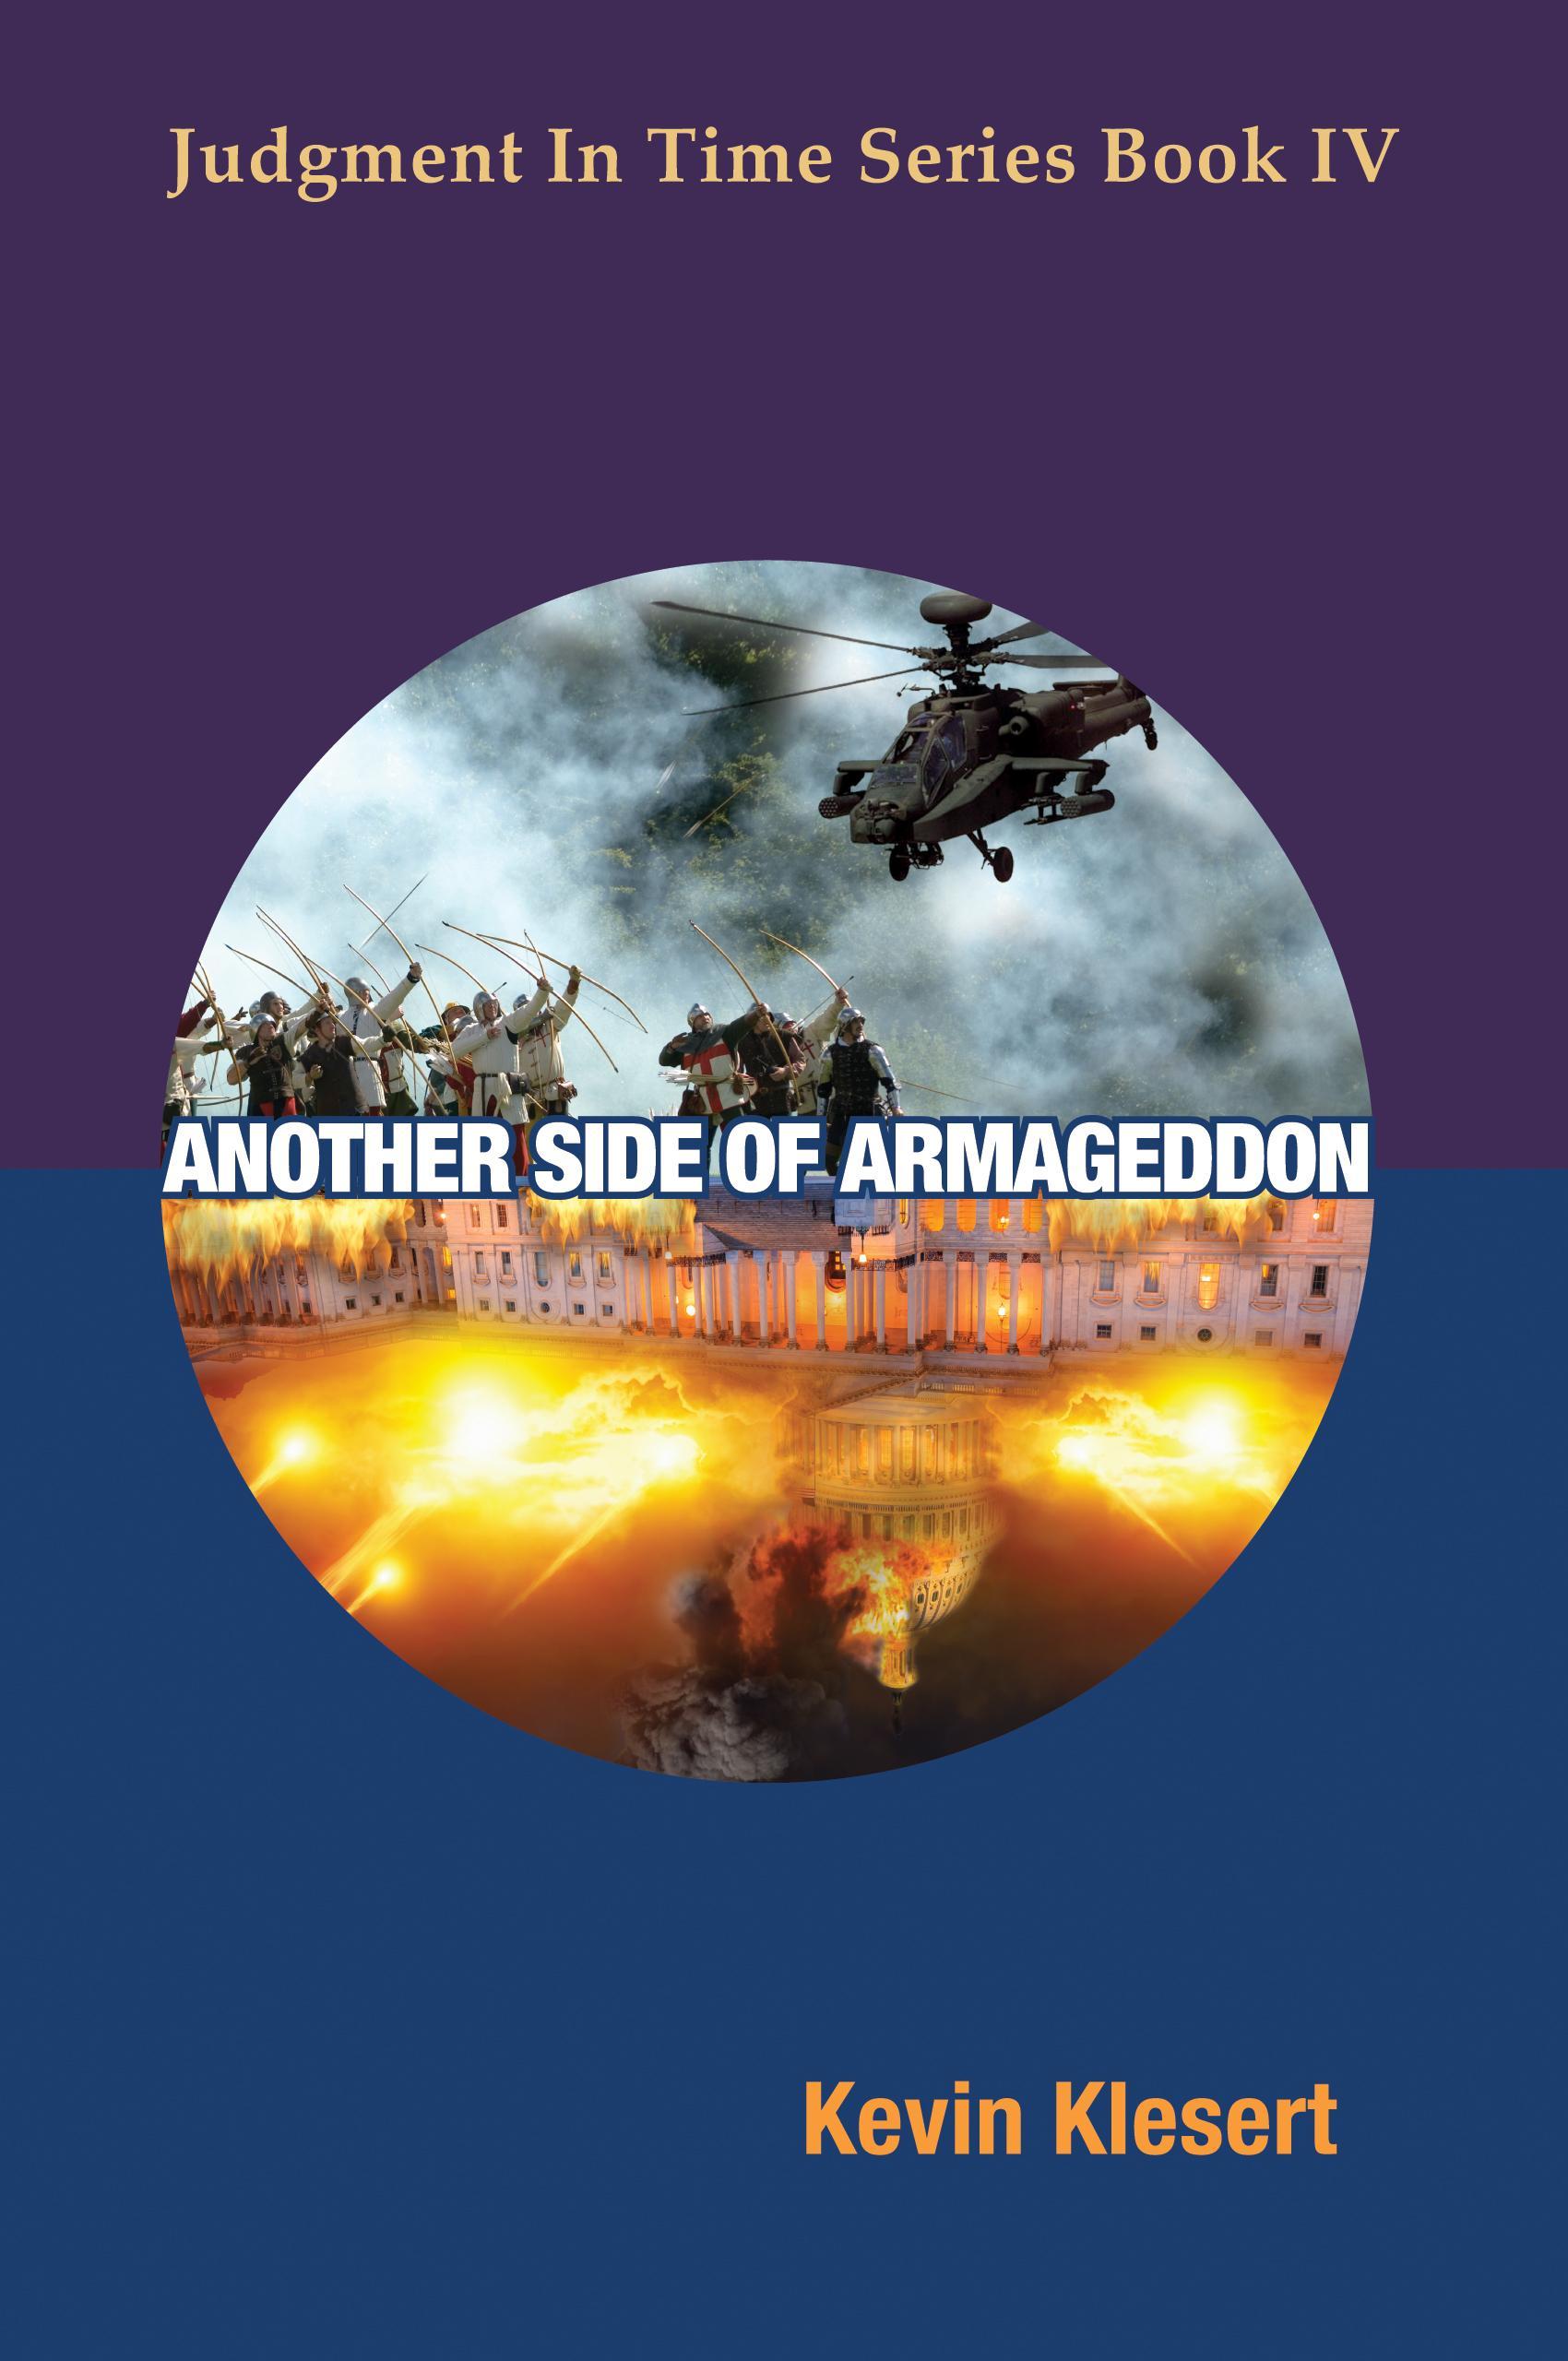 Armageddon definition